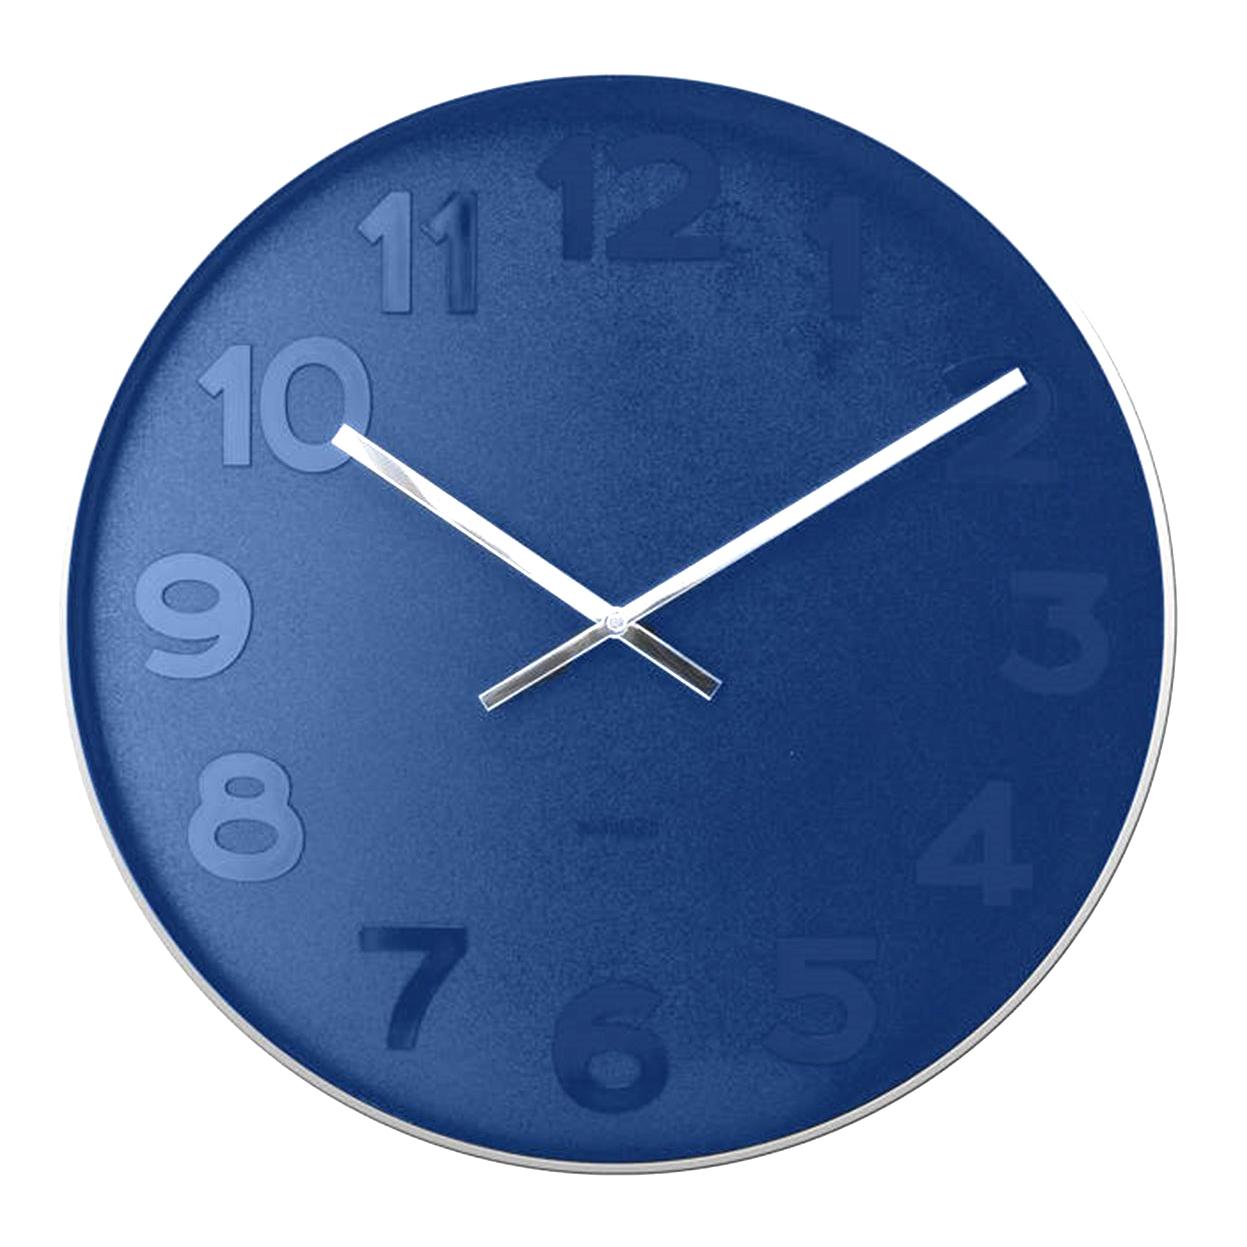 Karlsson Mr Blue numbers steel rim wall clock - Ø 37.5 x 6 cm | The Design Gift Shop